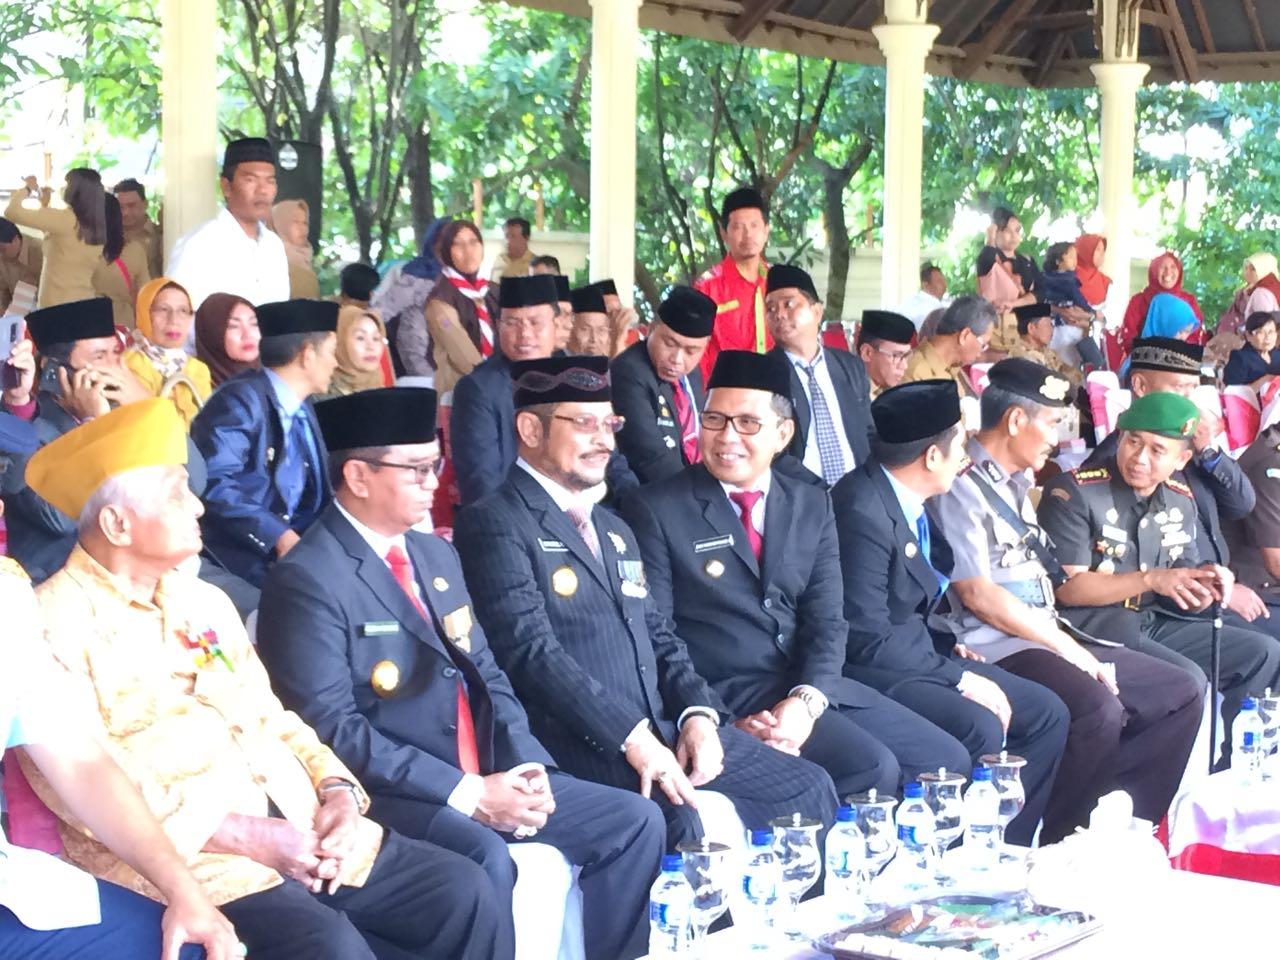 Pemkot Makassar Peringati Hari Korban 40 000 Jiwa 71 Nusakini